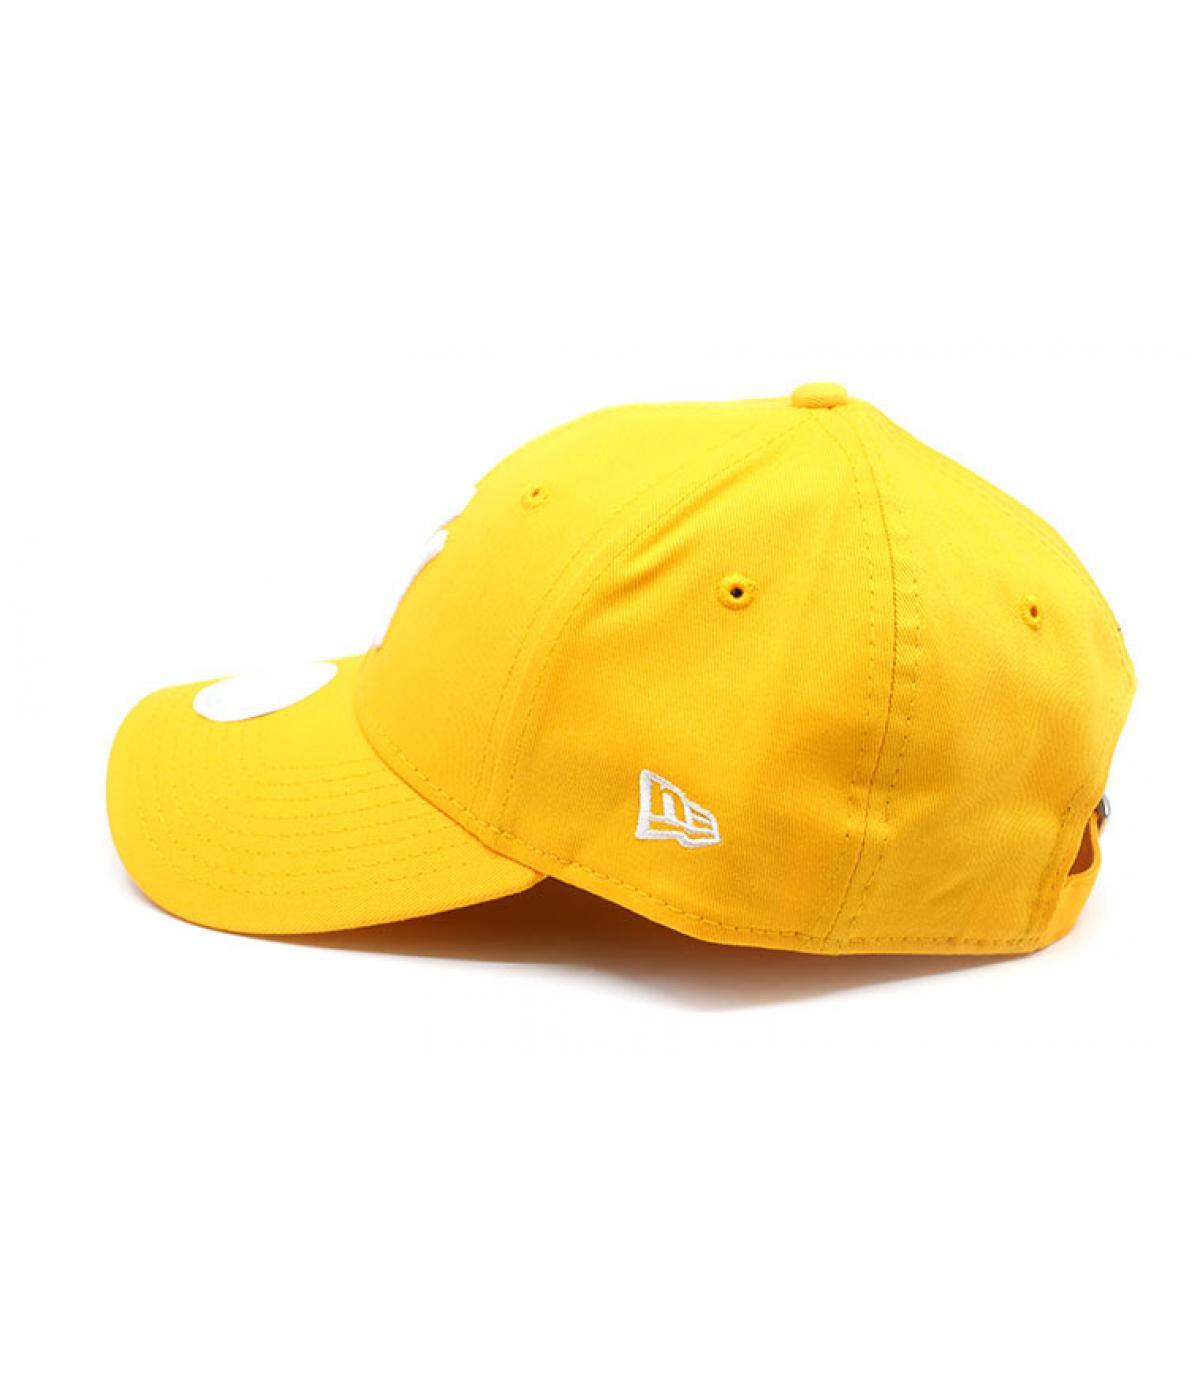 Details Cap  Wmns League Ess NY 9Forty gold - Abbildung 4